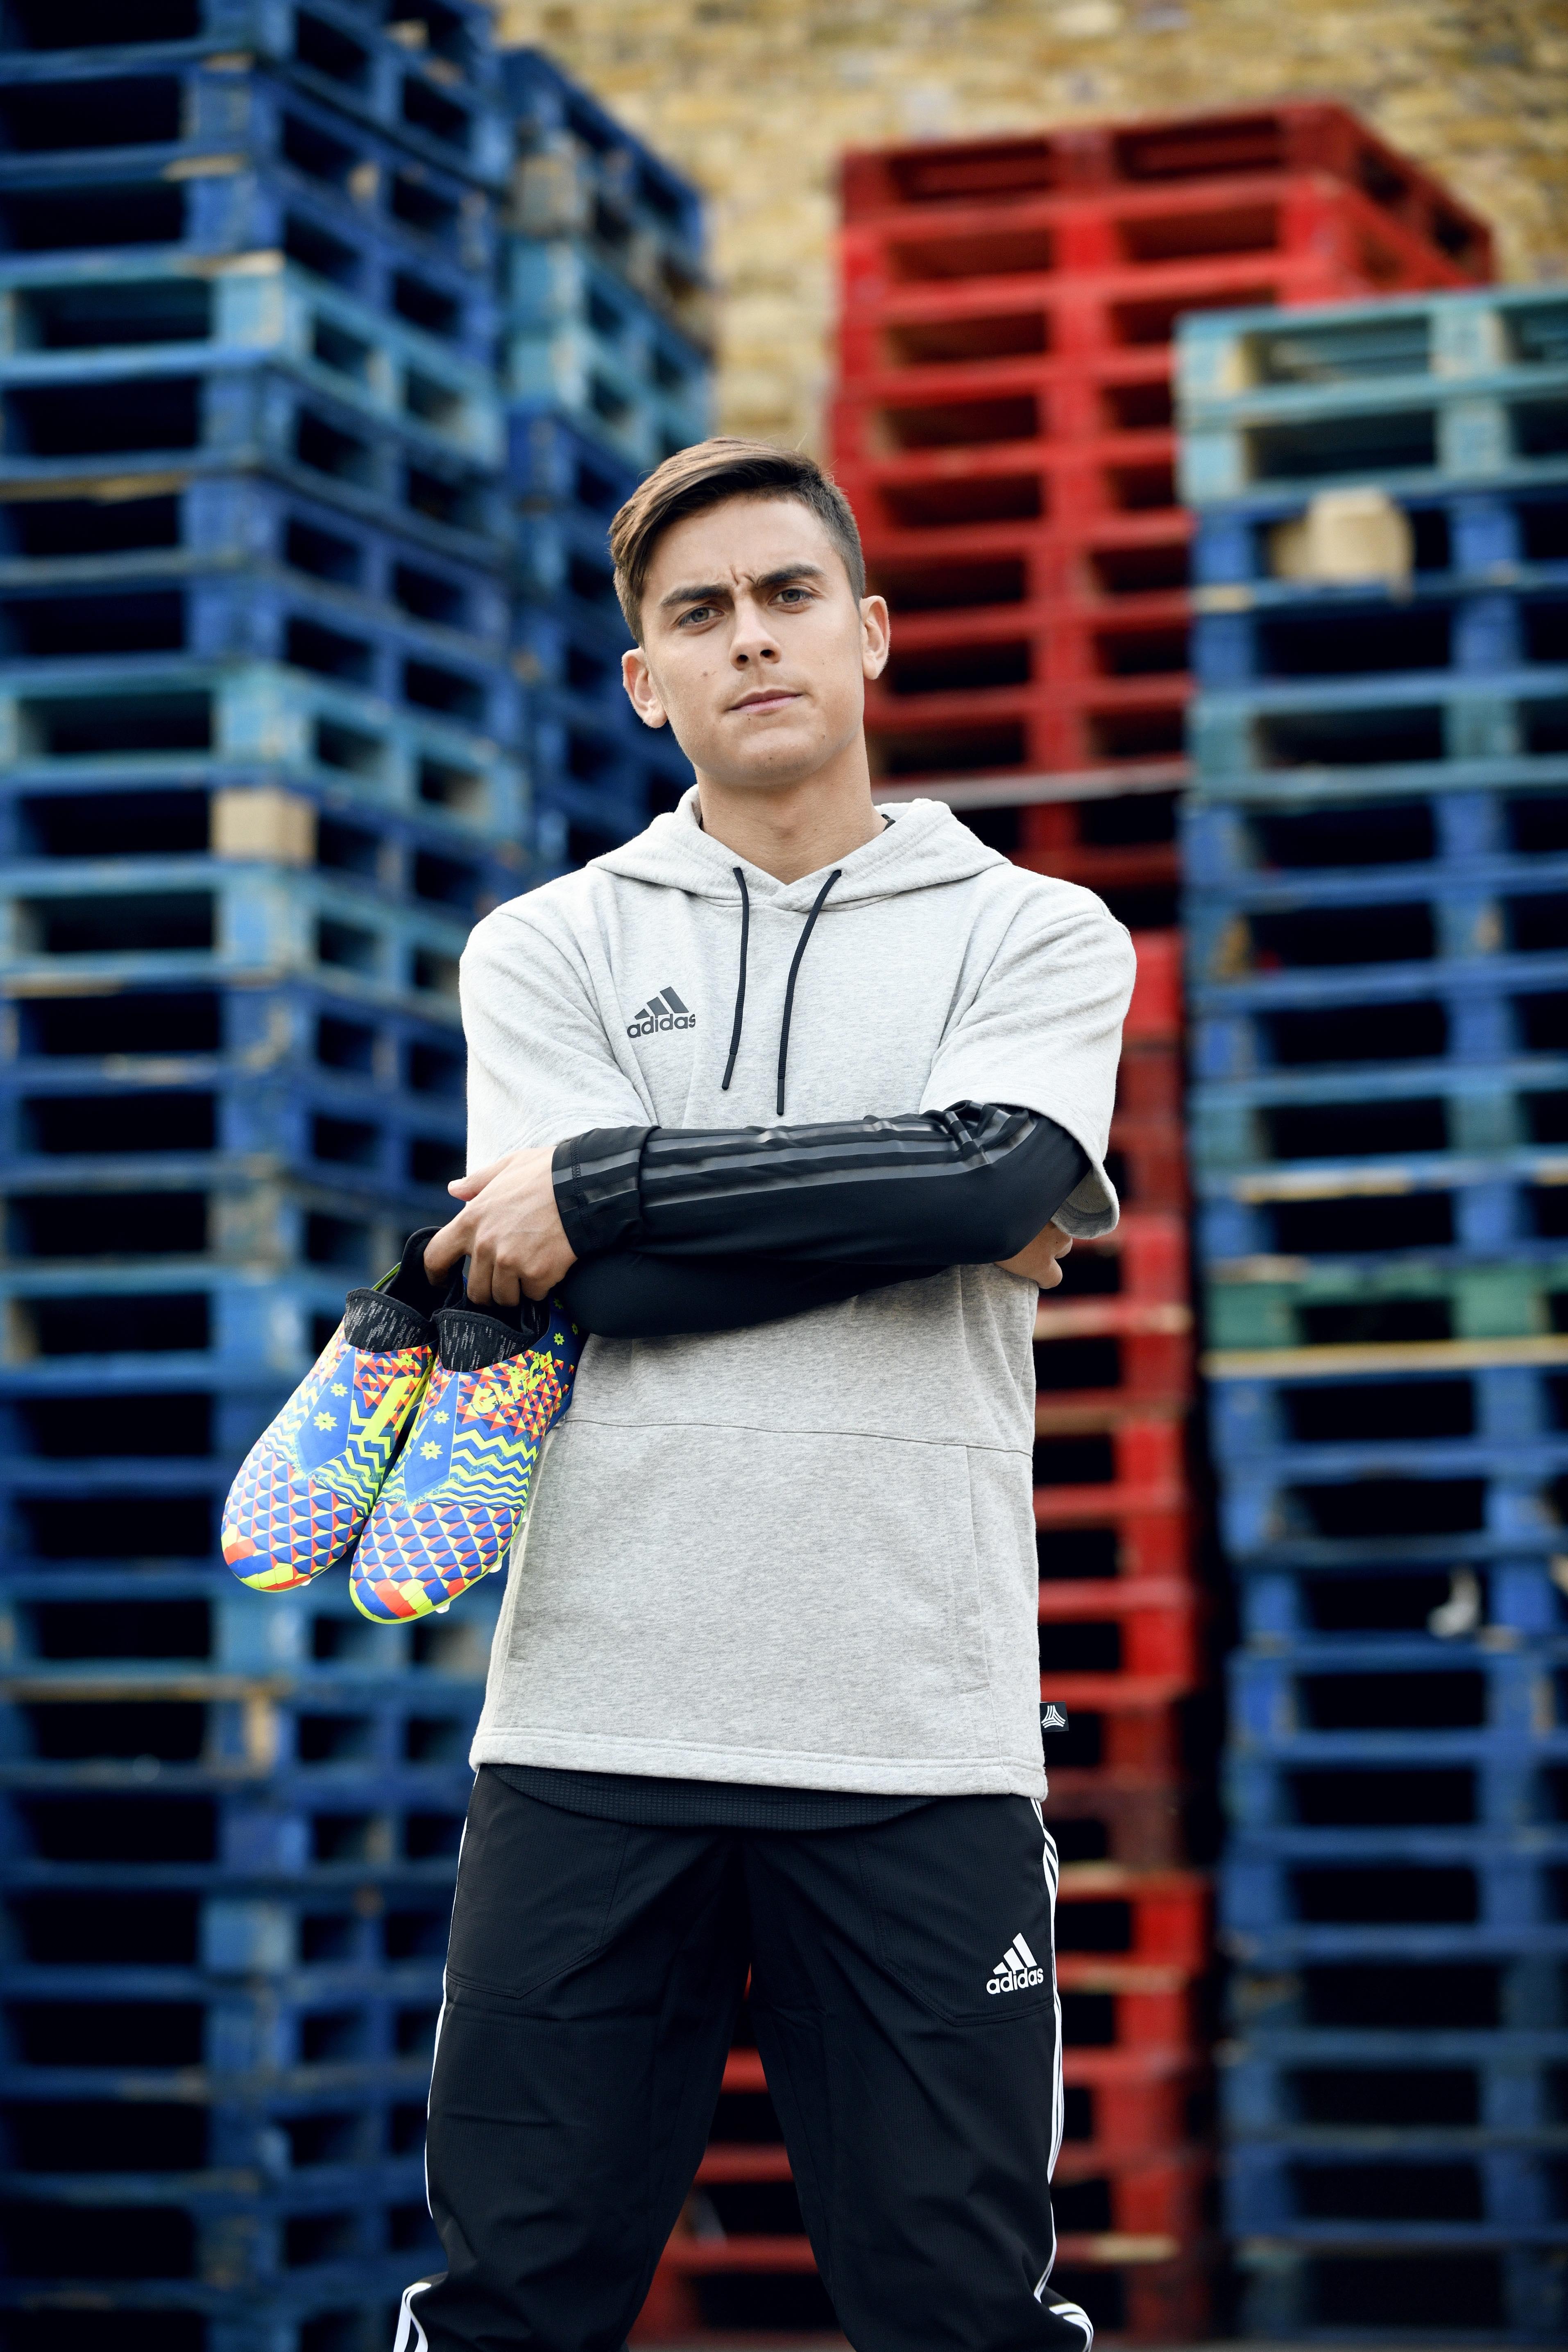 Paulo Dybala Adidas 2